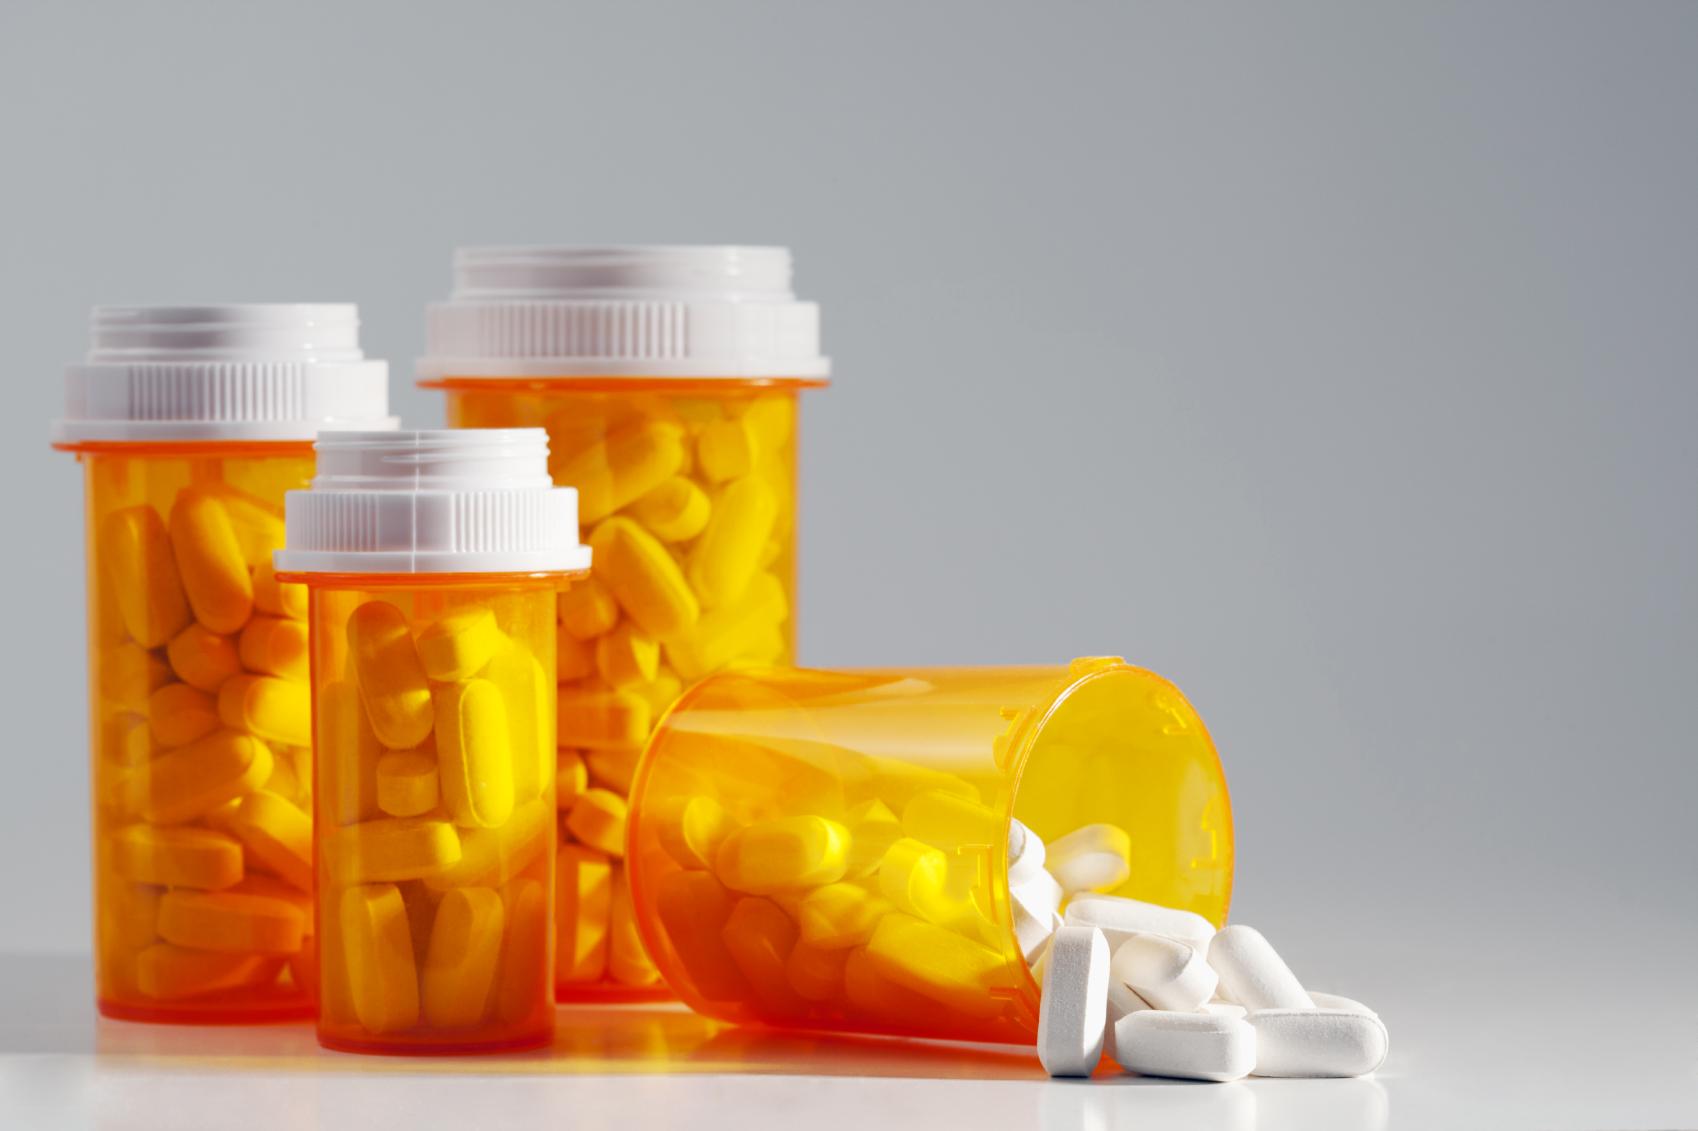 Prescription Medication Recallcine Bottle